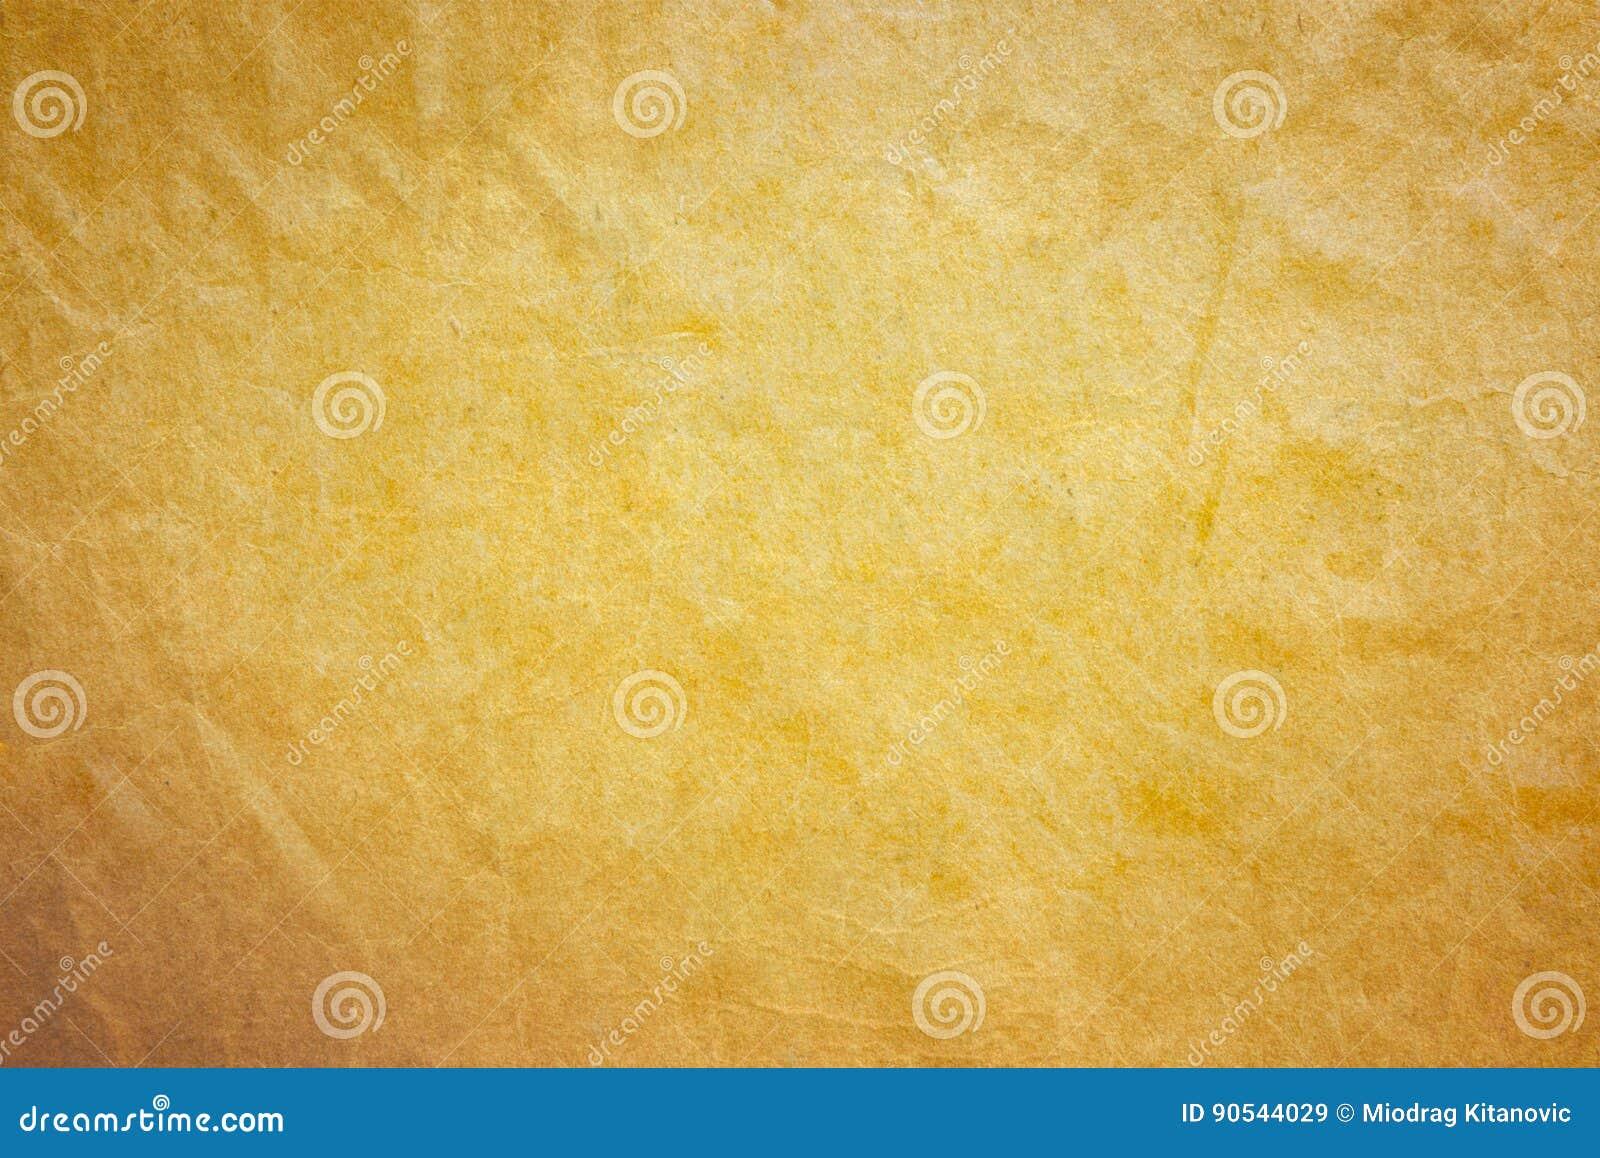 Oude gouden document achtergrond